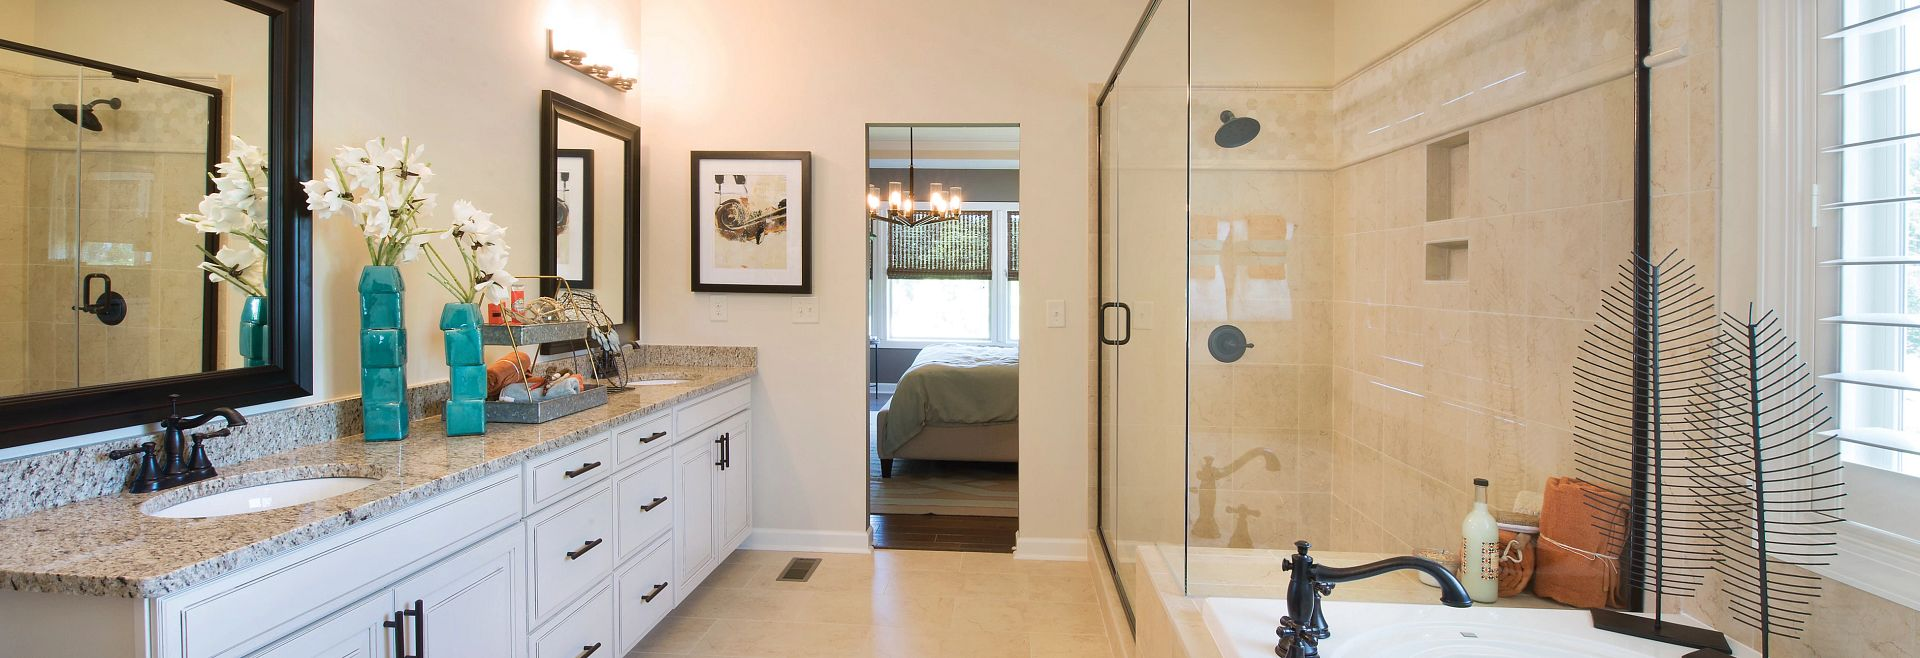 Redwood plan Owner's Bath